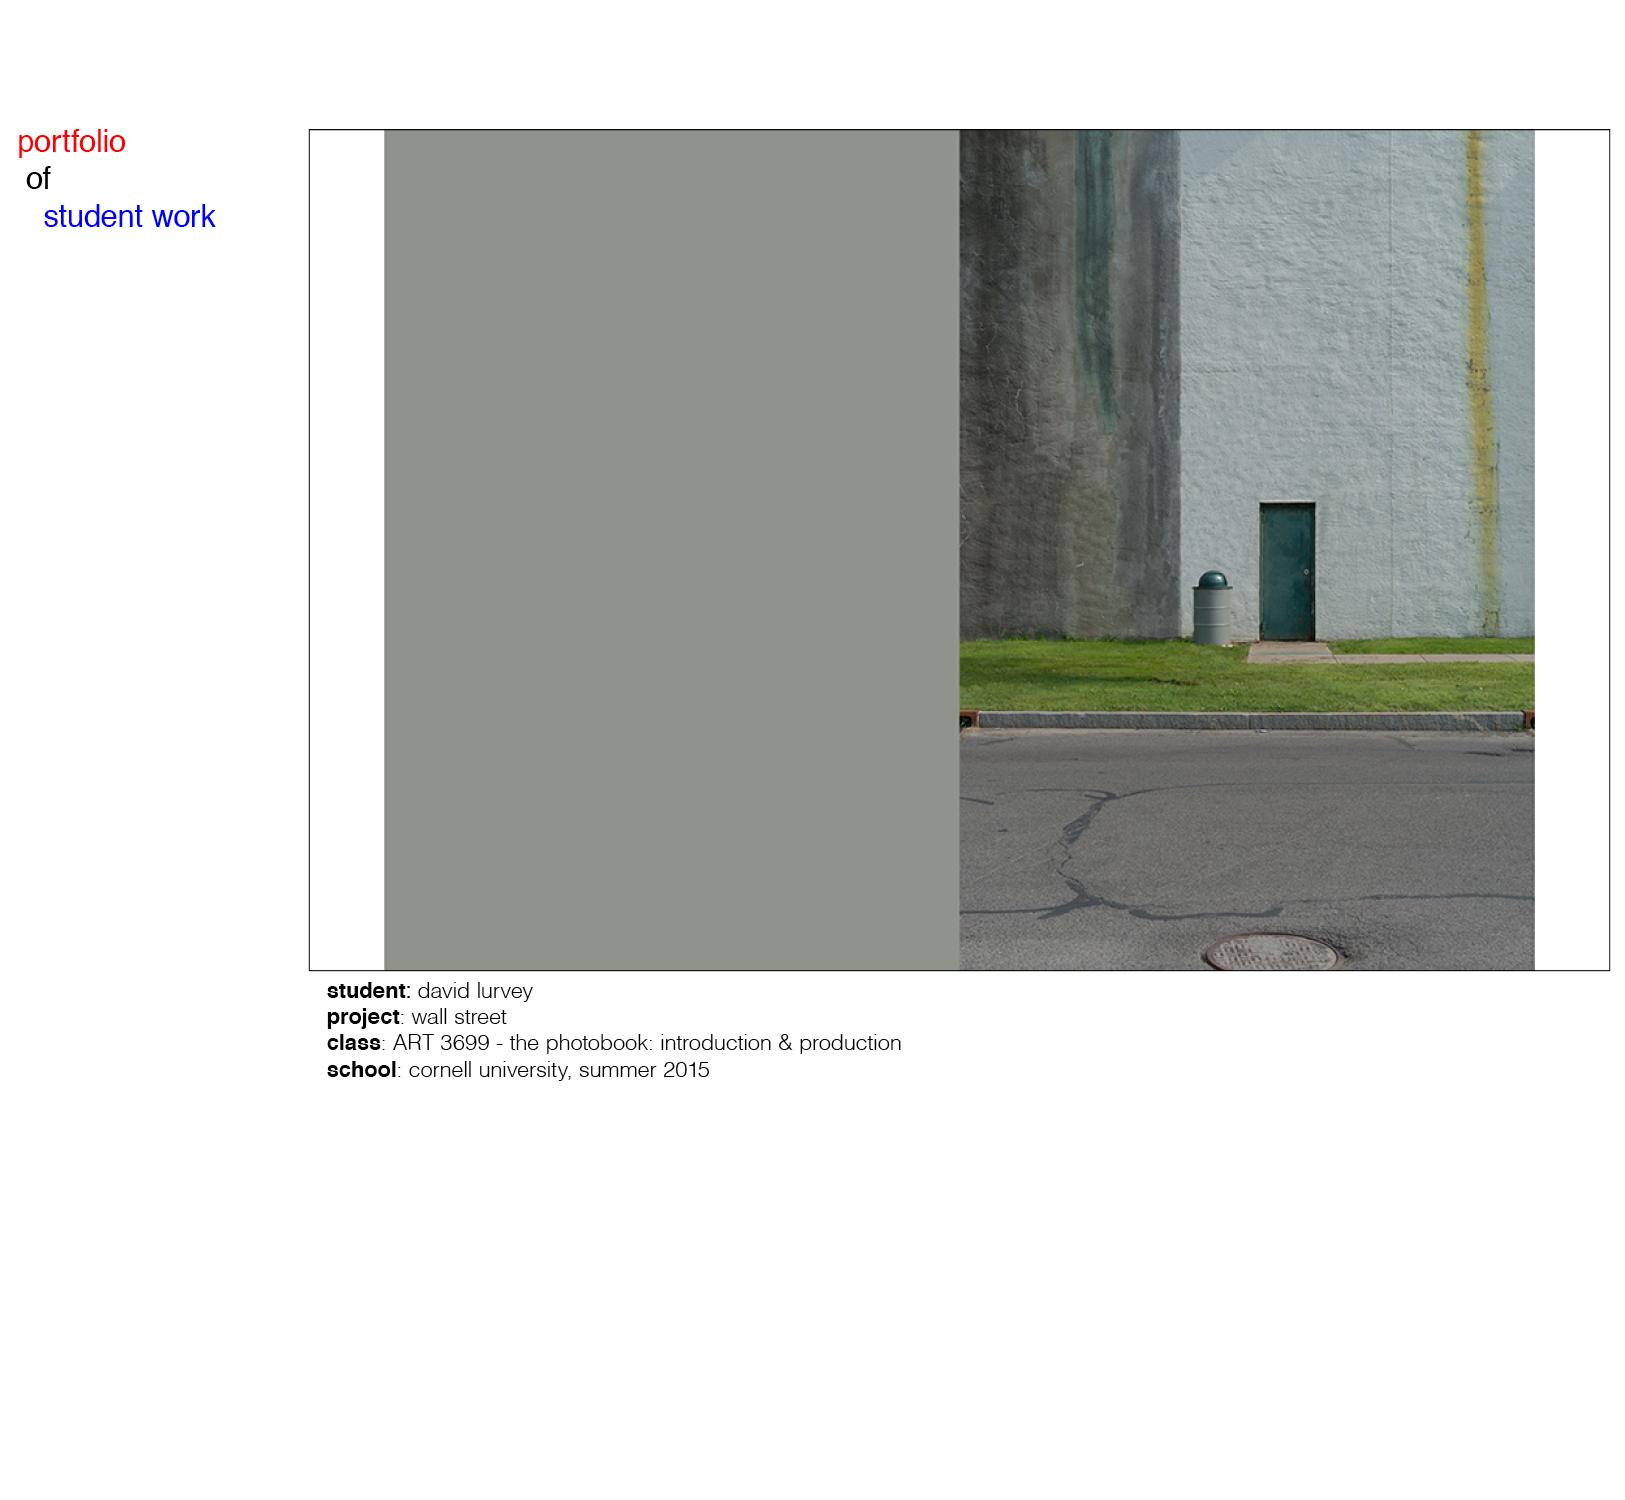 wall_street_007.jpg